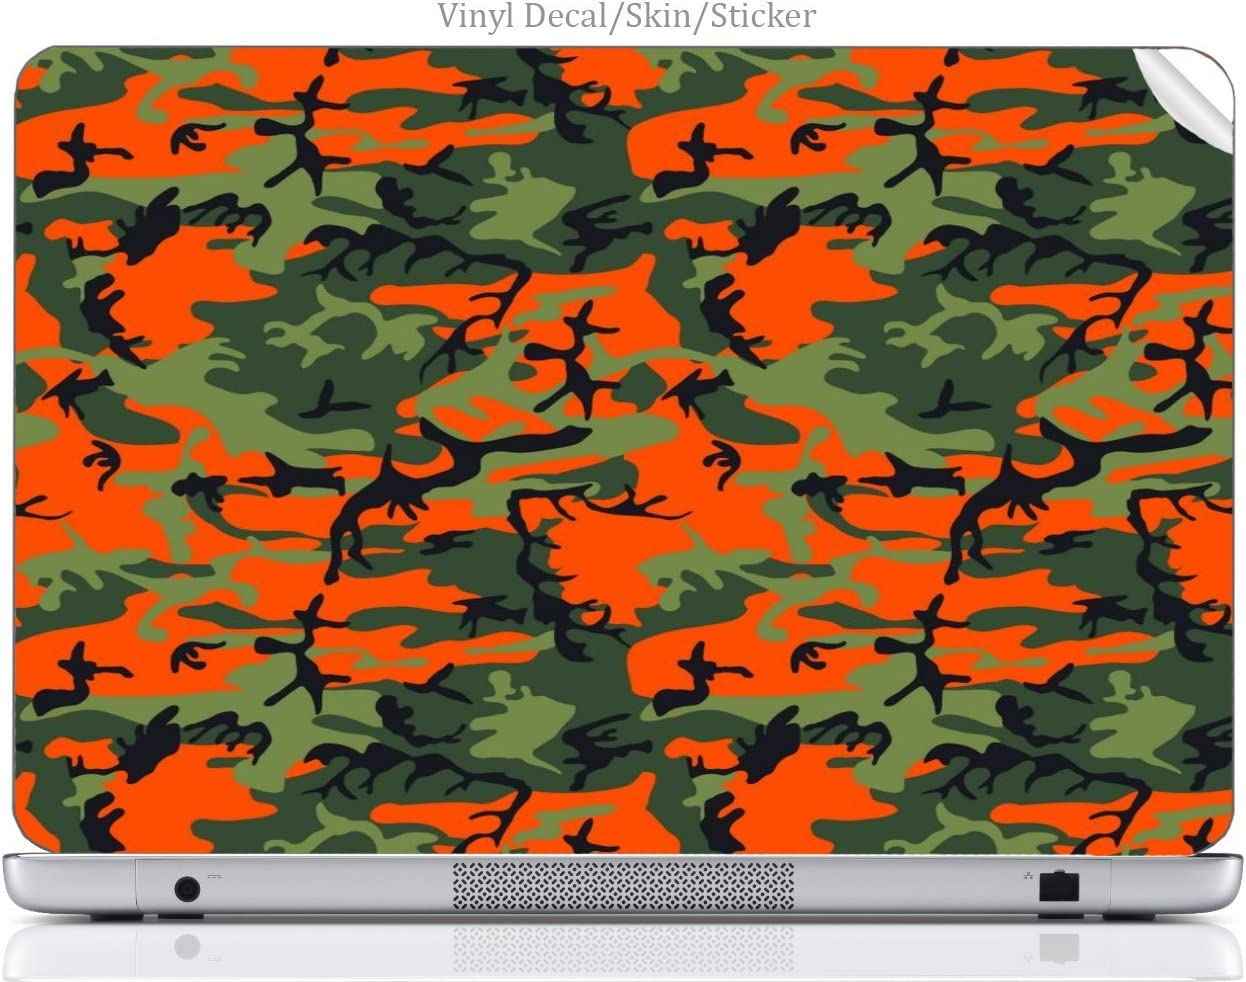 Laptop VINYL DECAL Sticker Skin Print Orange & Green Camo Custom Art fits Hp Elitebook 8460p